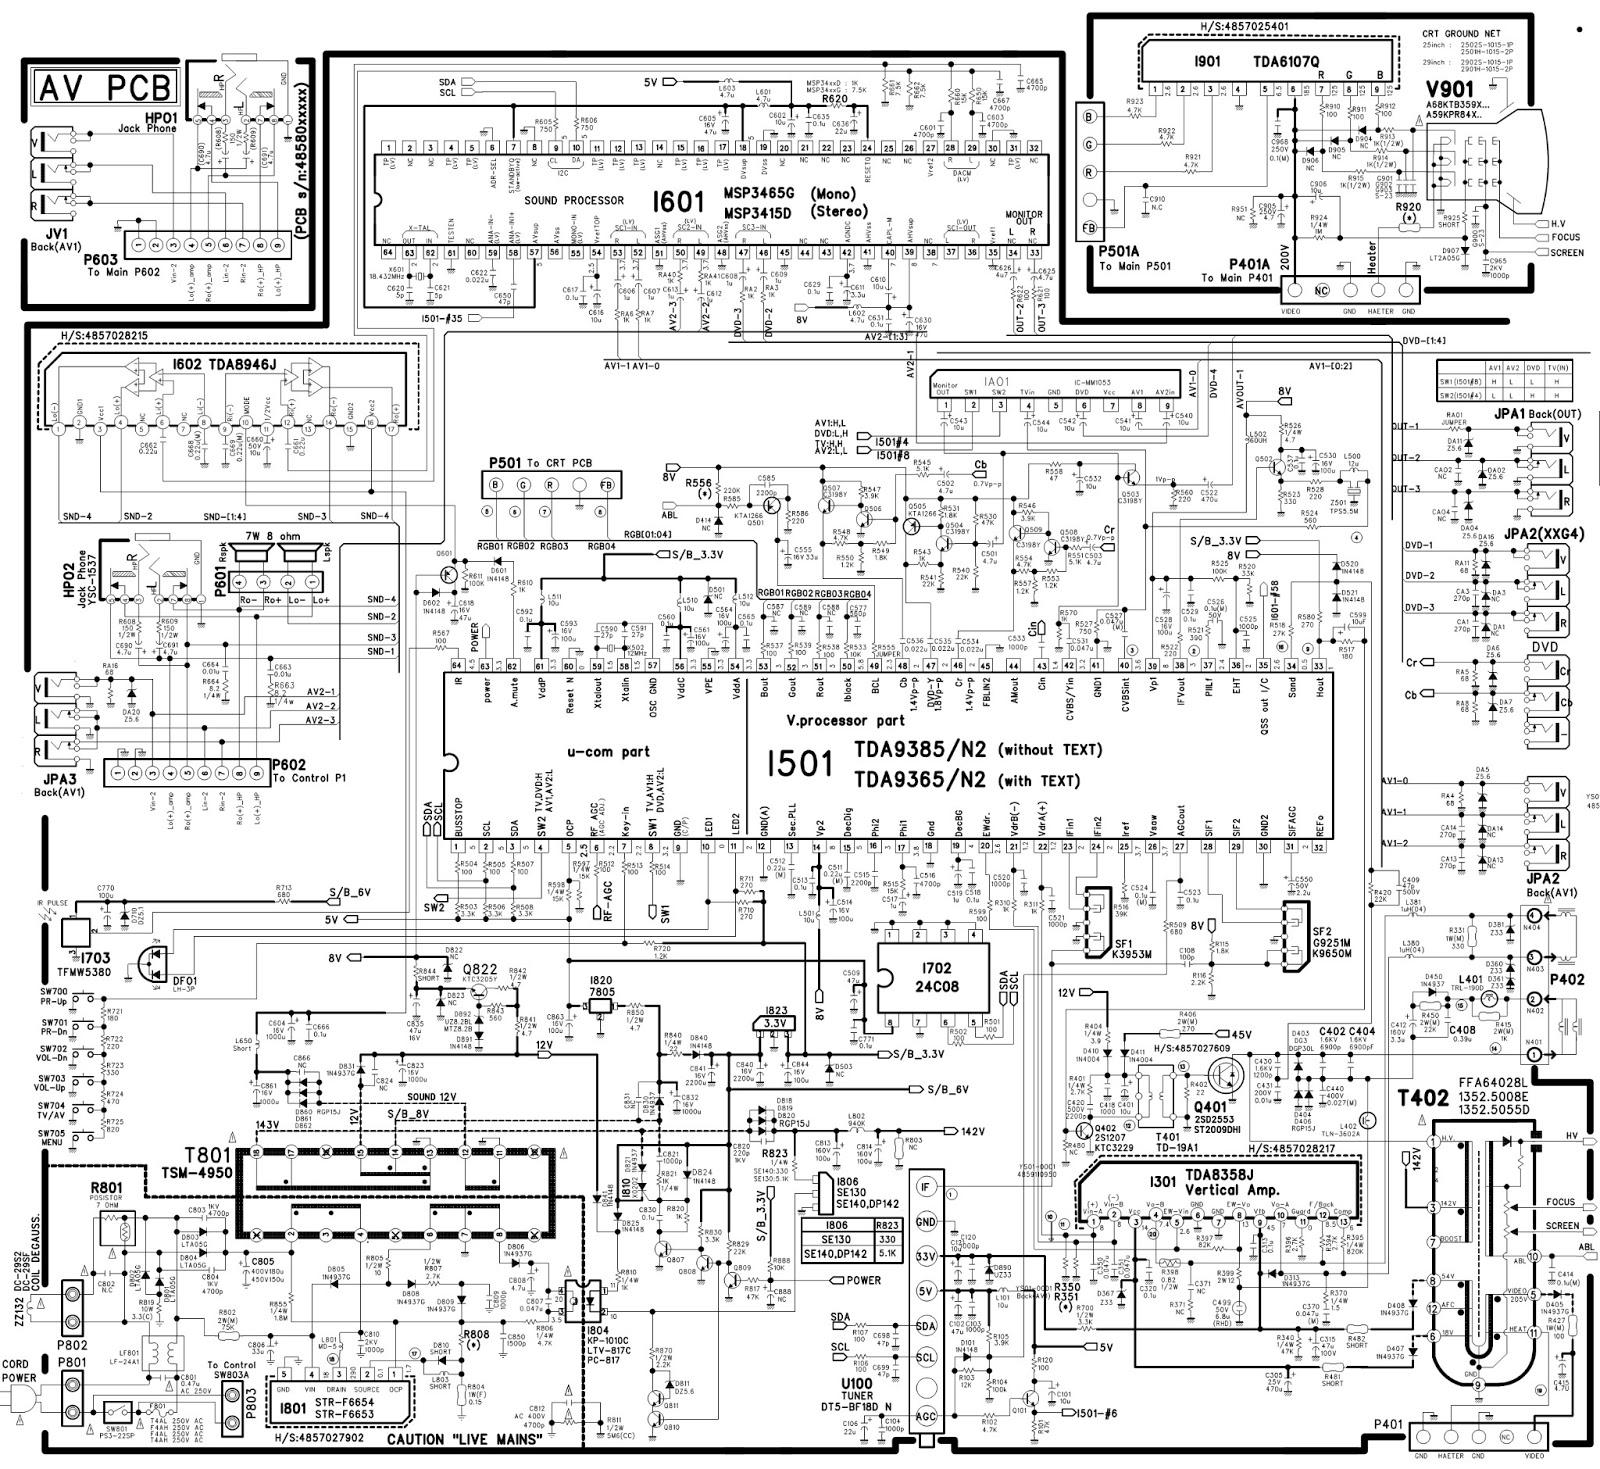 Electrical Logic Diagram Manual Guide Wiring Ladder Symbols Nec Drawing Pdf U2022 Edmiracle Co